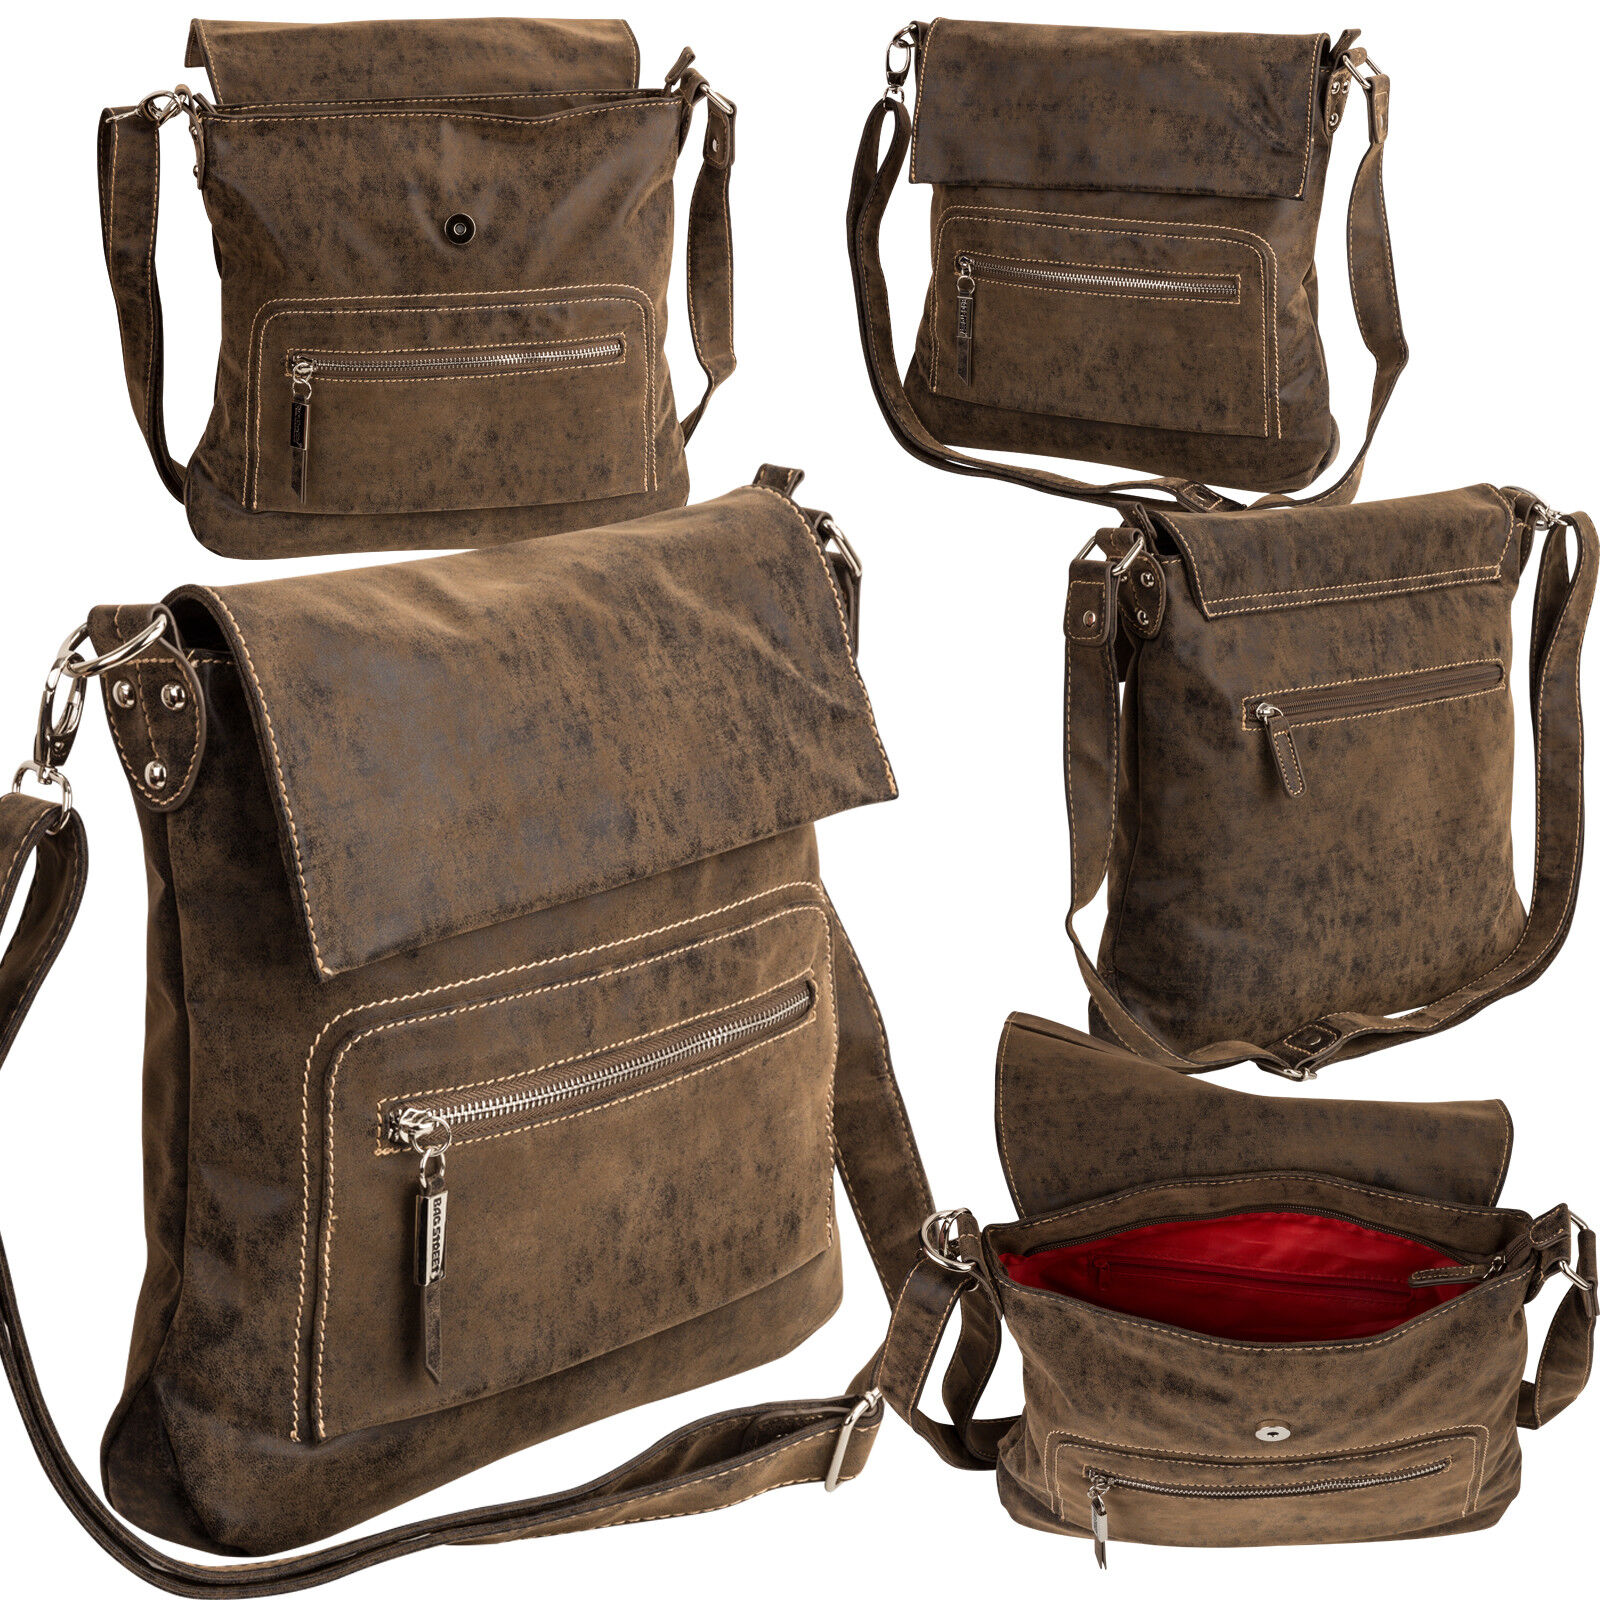 Bag Street Damentasche Umhängetasche Handtasche Schultertasche K2 T0107 Antikbraun